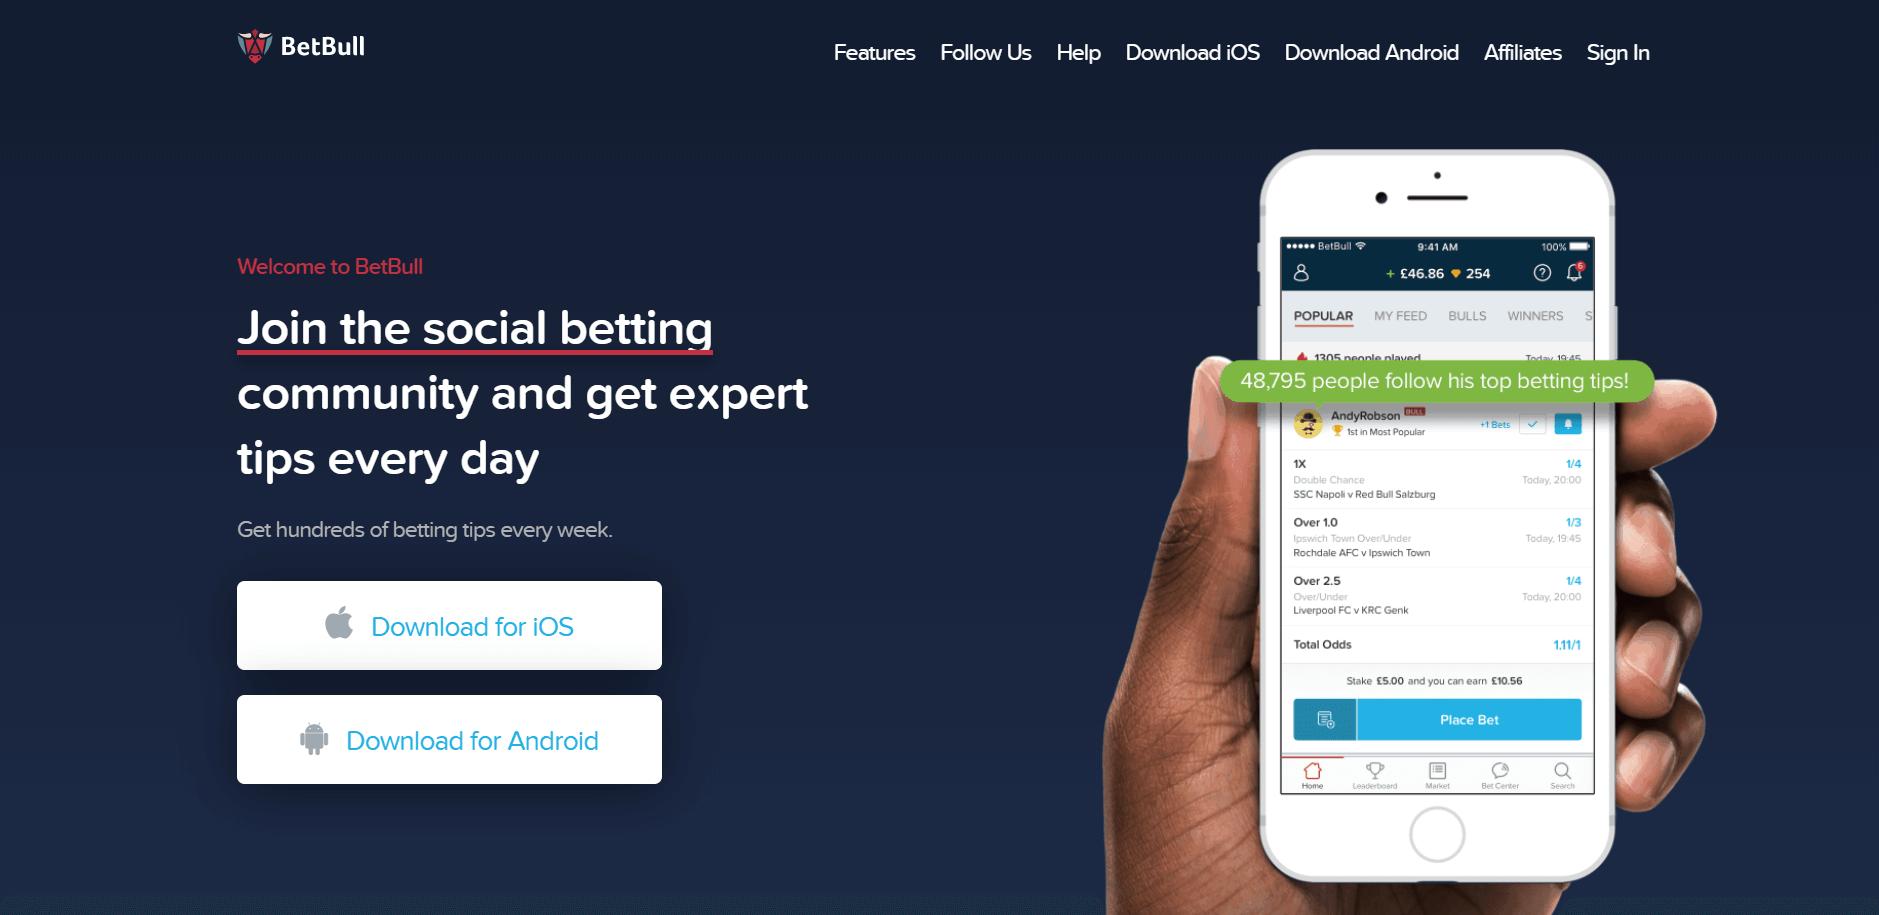 Betbull social betting app homepage